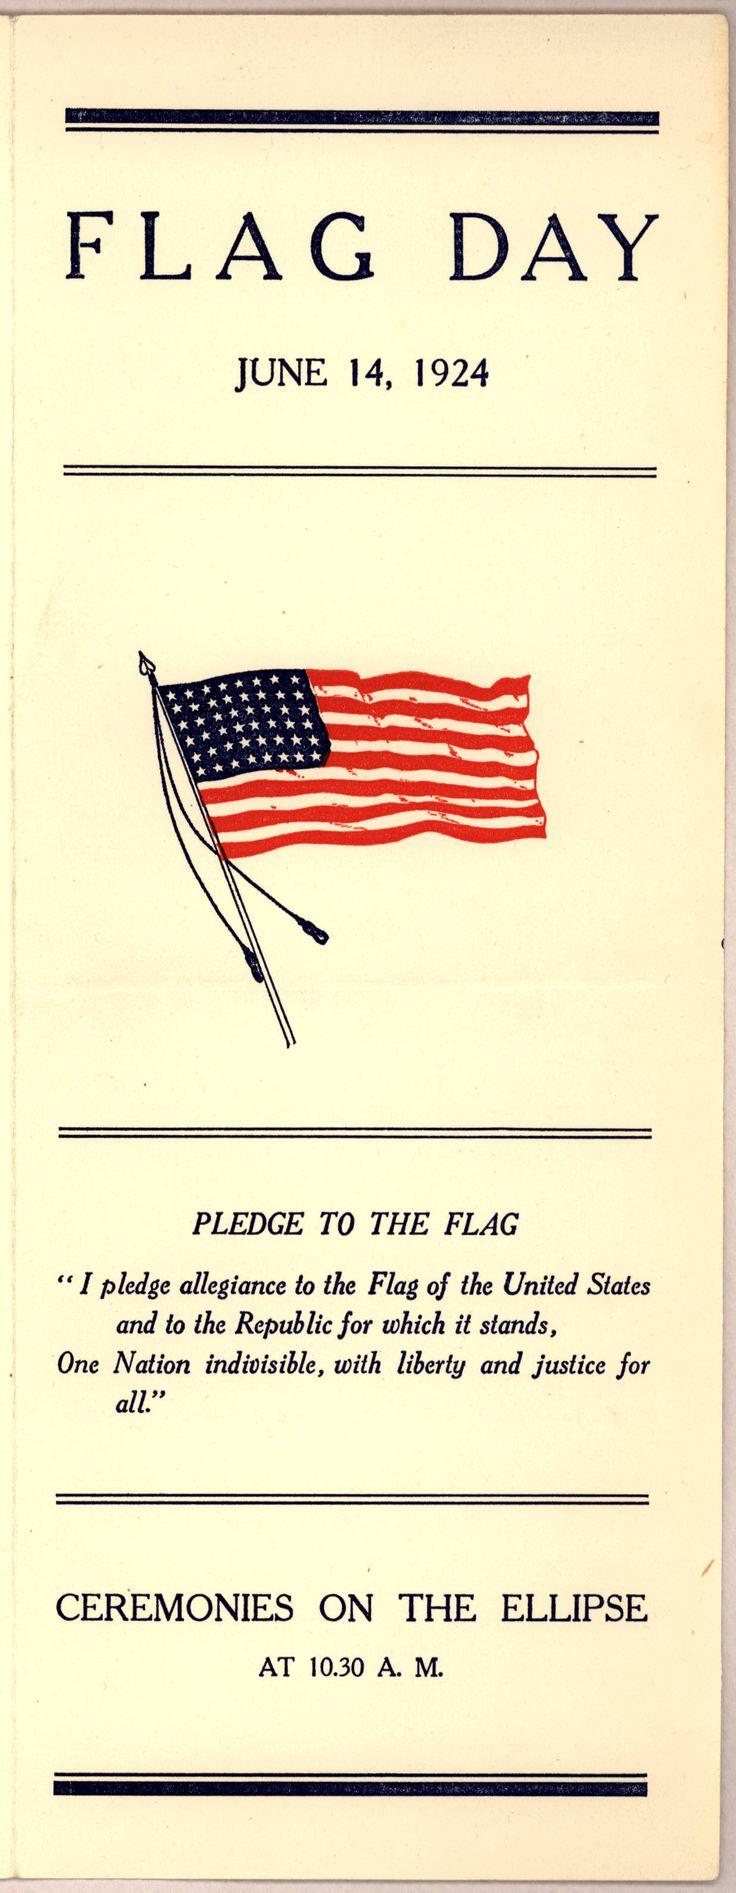 Flag Day, Washington D.C., June 14, 1924 (with original pledge of allegiance)